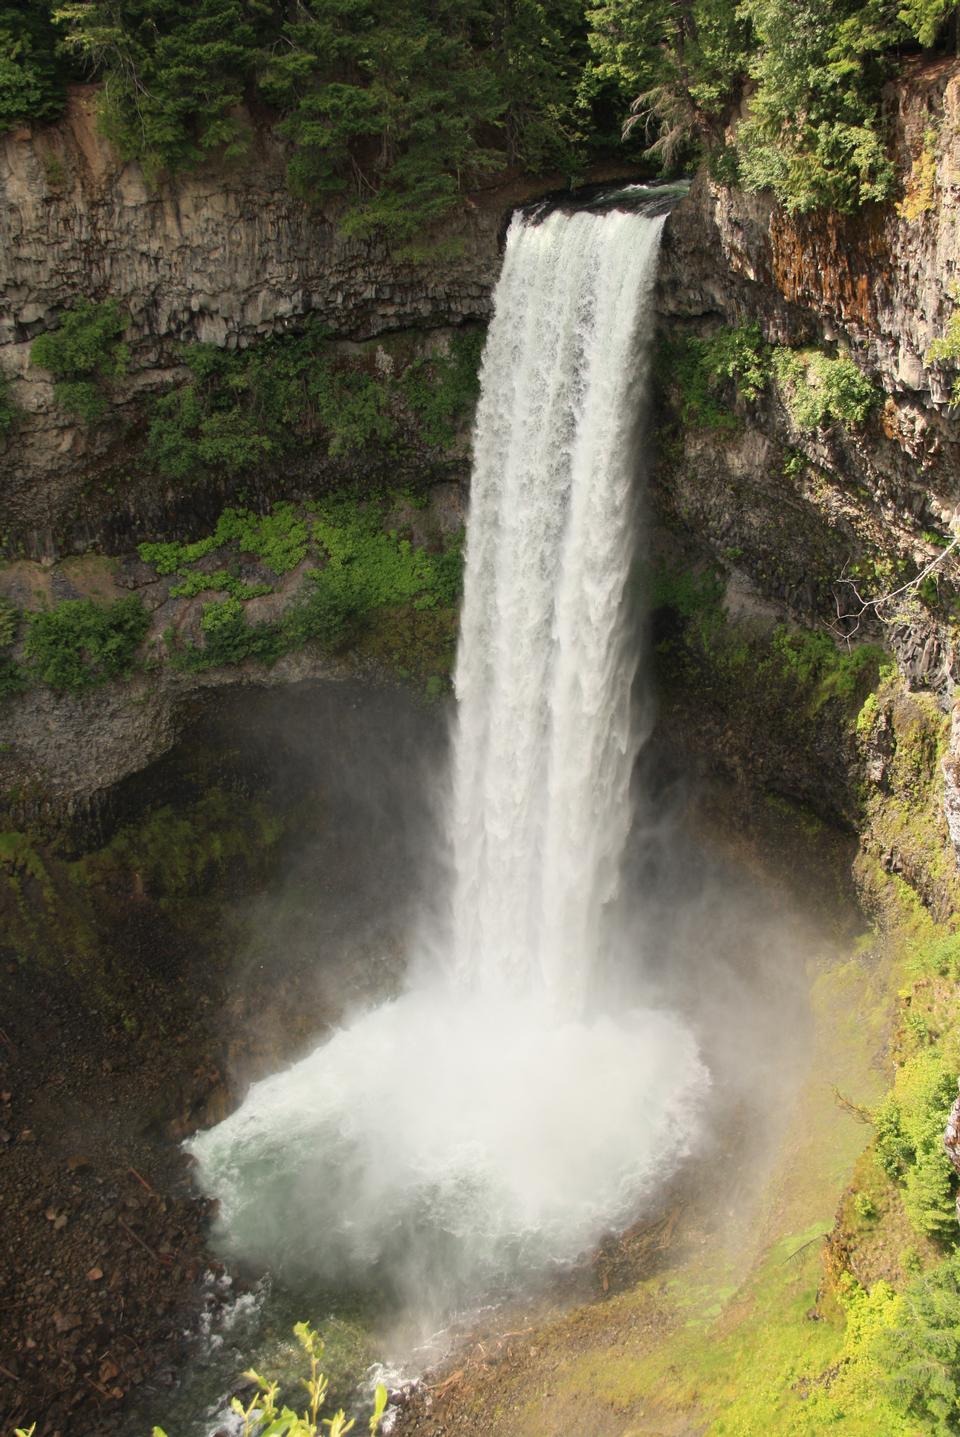 Brandywine Falls in Brandywine Falls Provincial Park